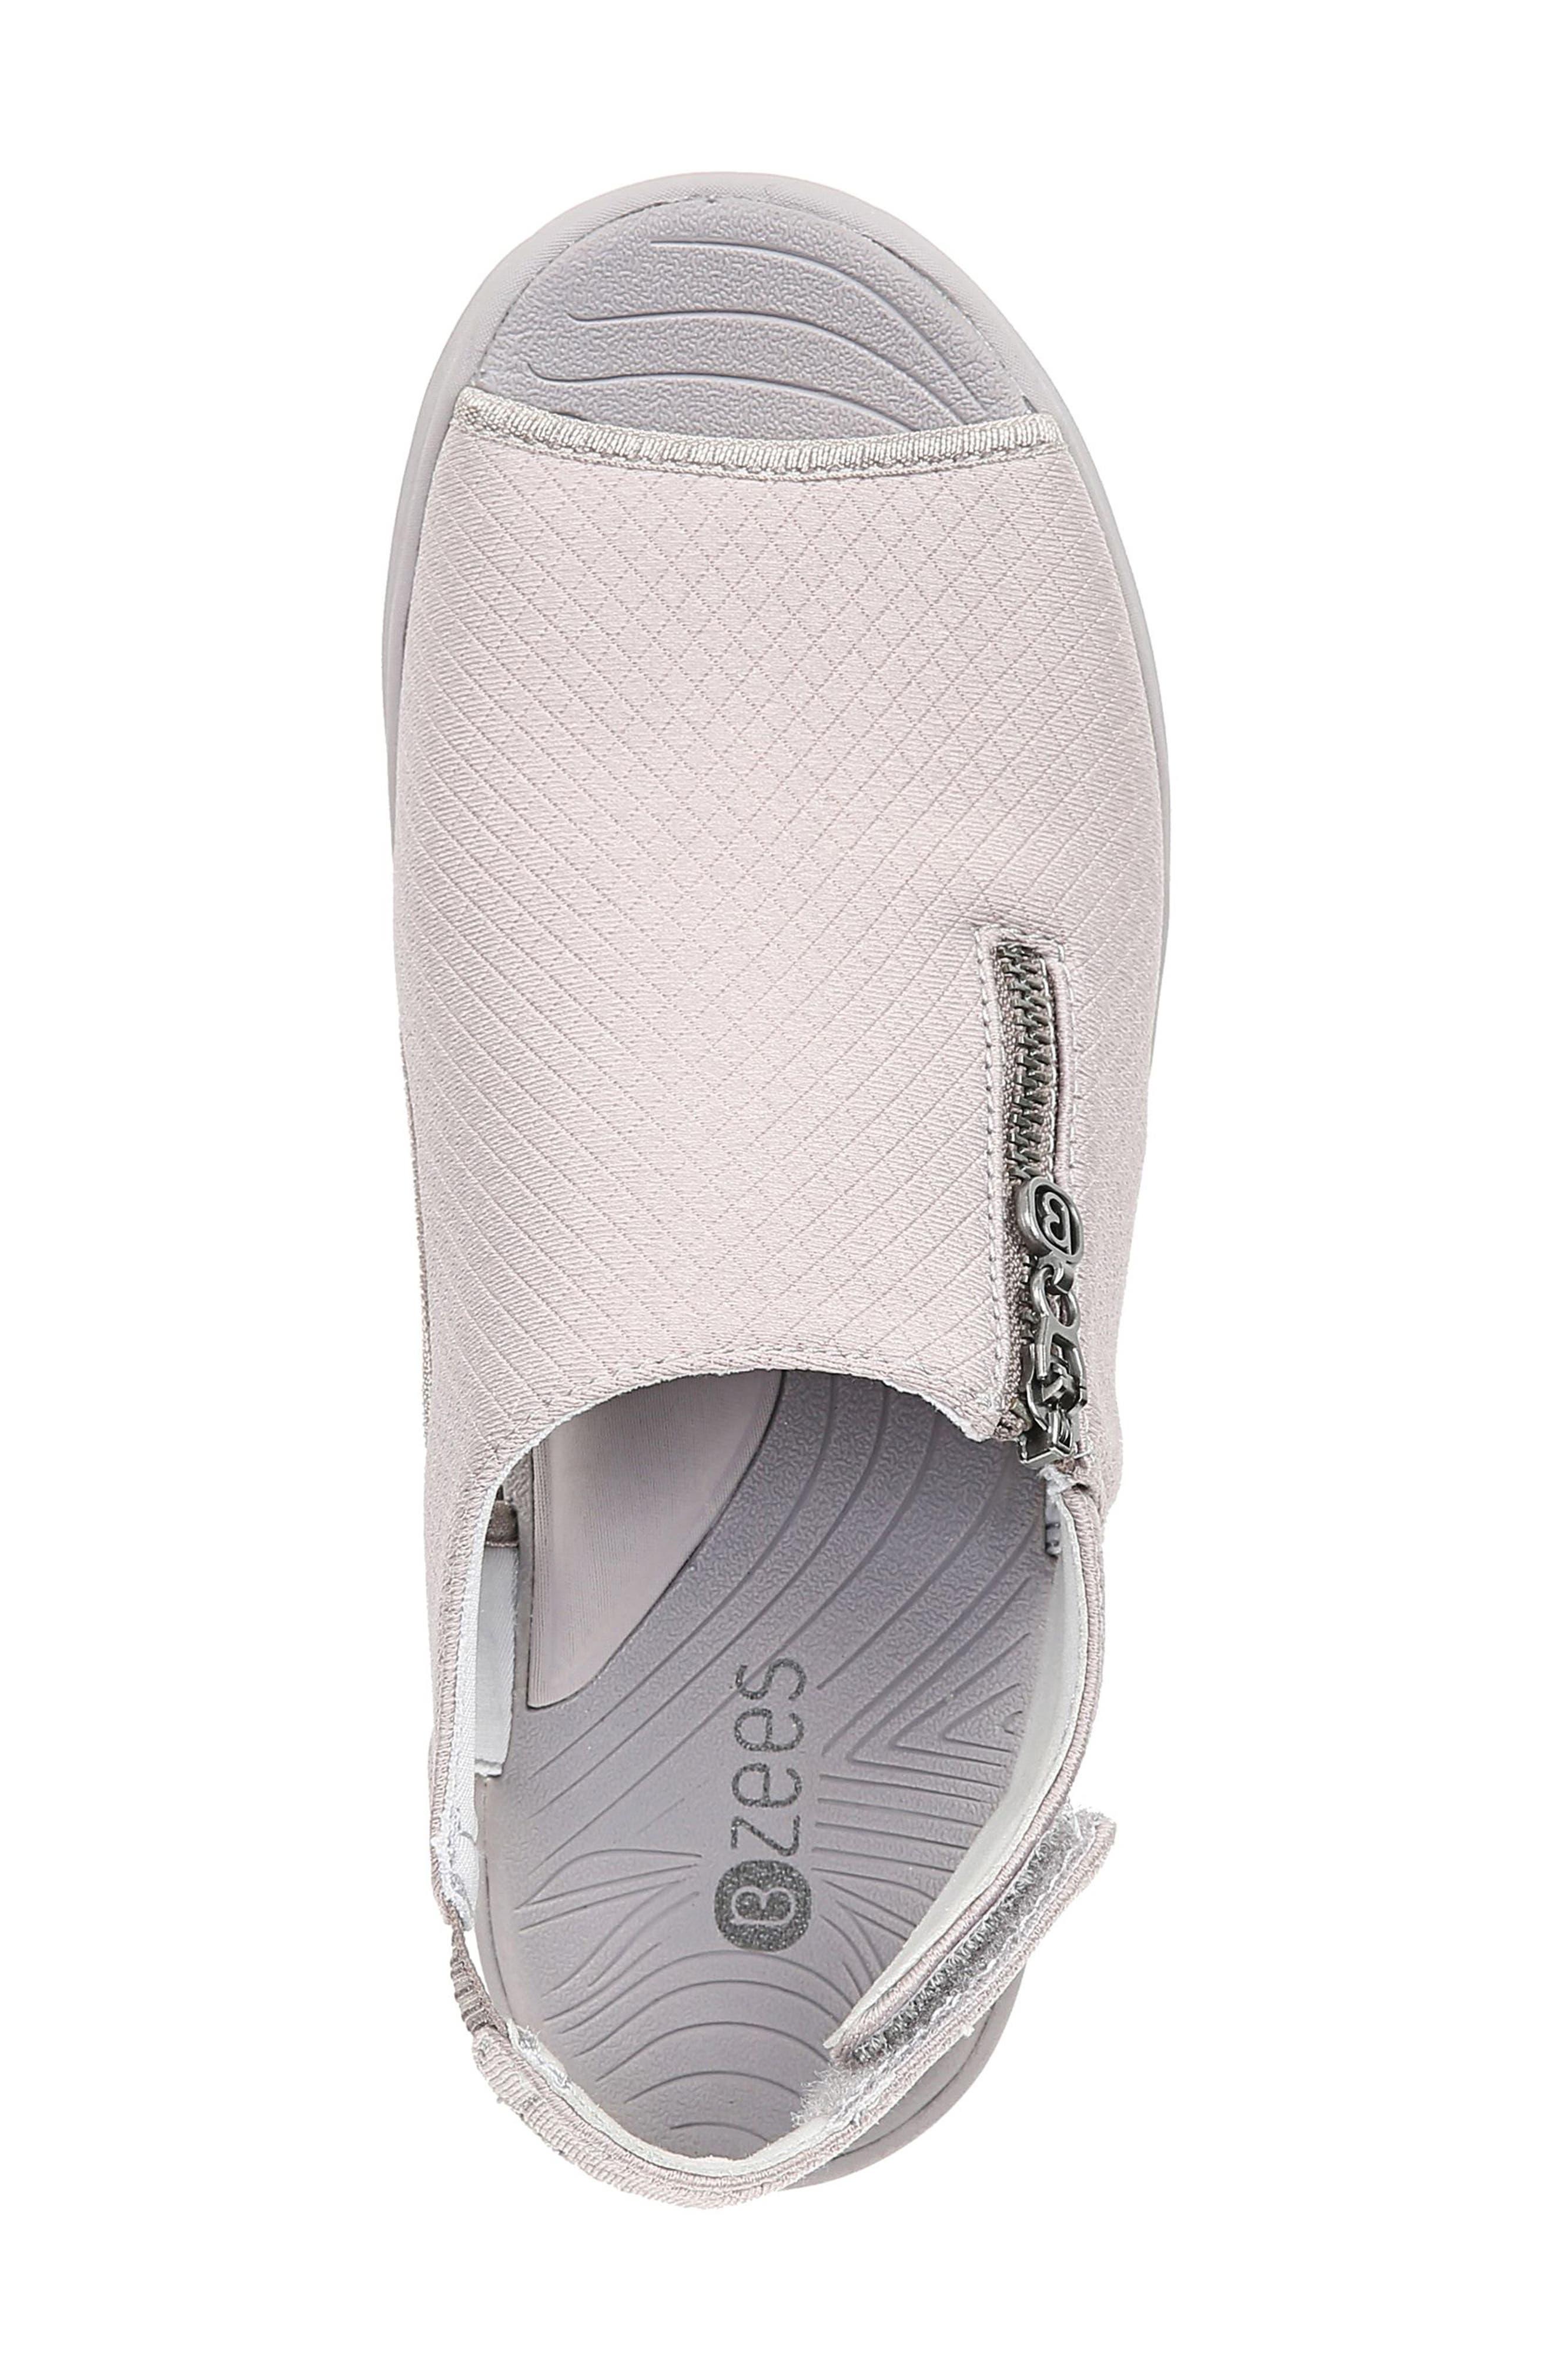 BZEES, Zipline Wedge Sandal, Alternate thumbnail 5, color, OPAL GRAY GRID FABRIC